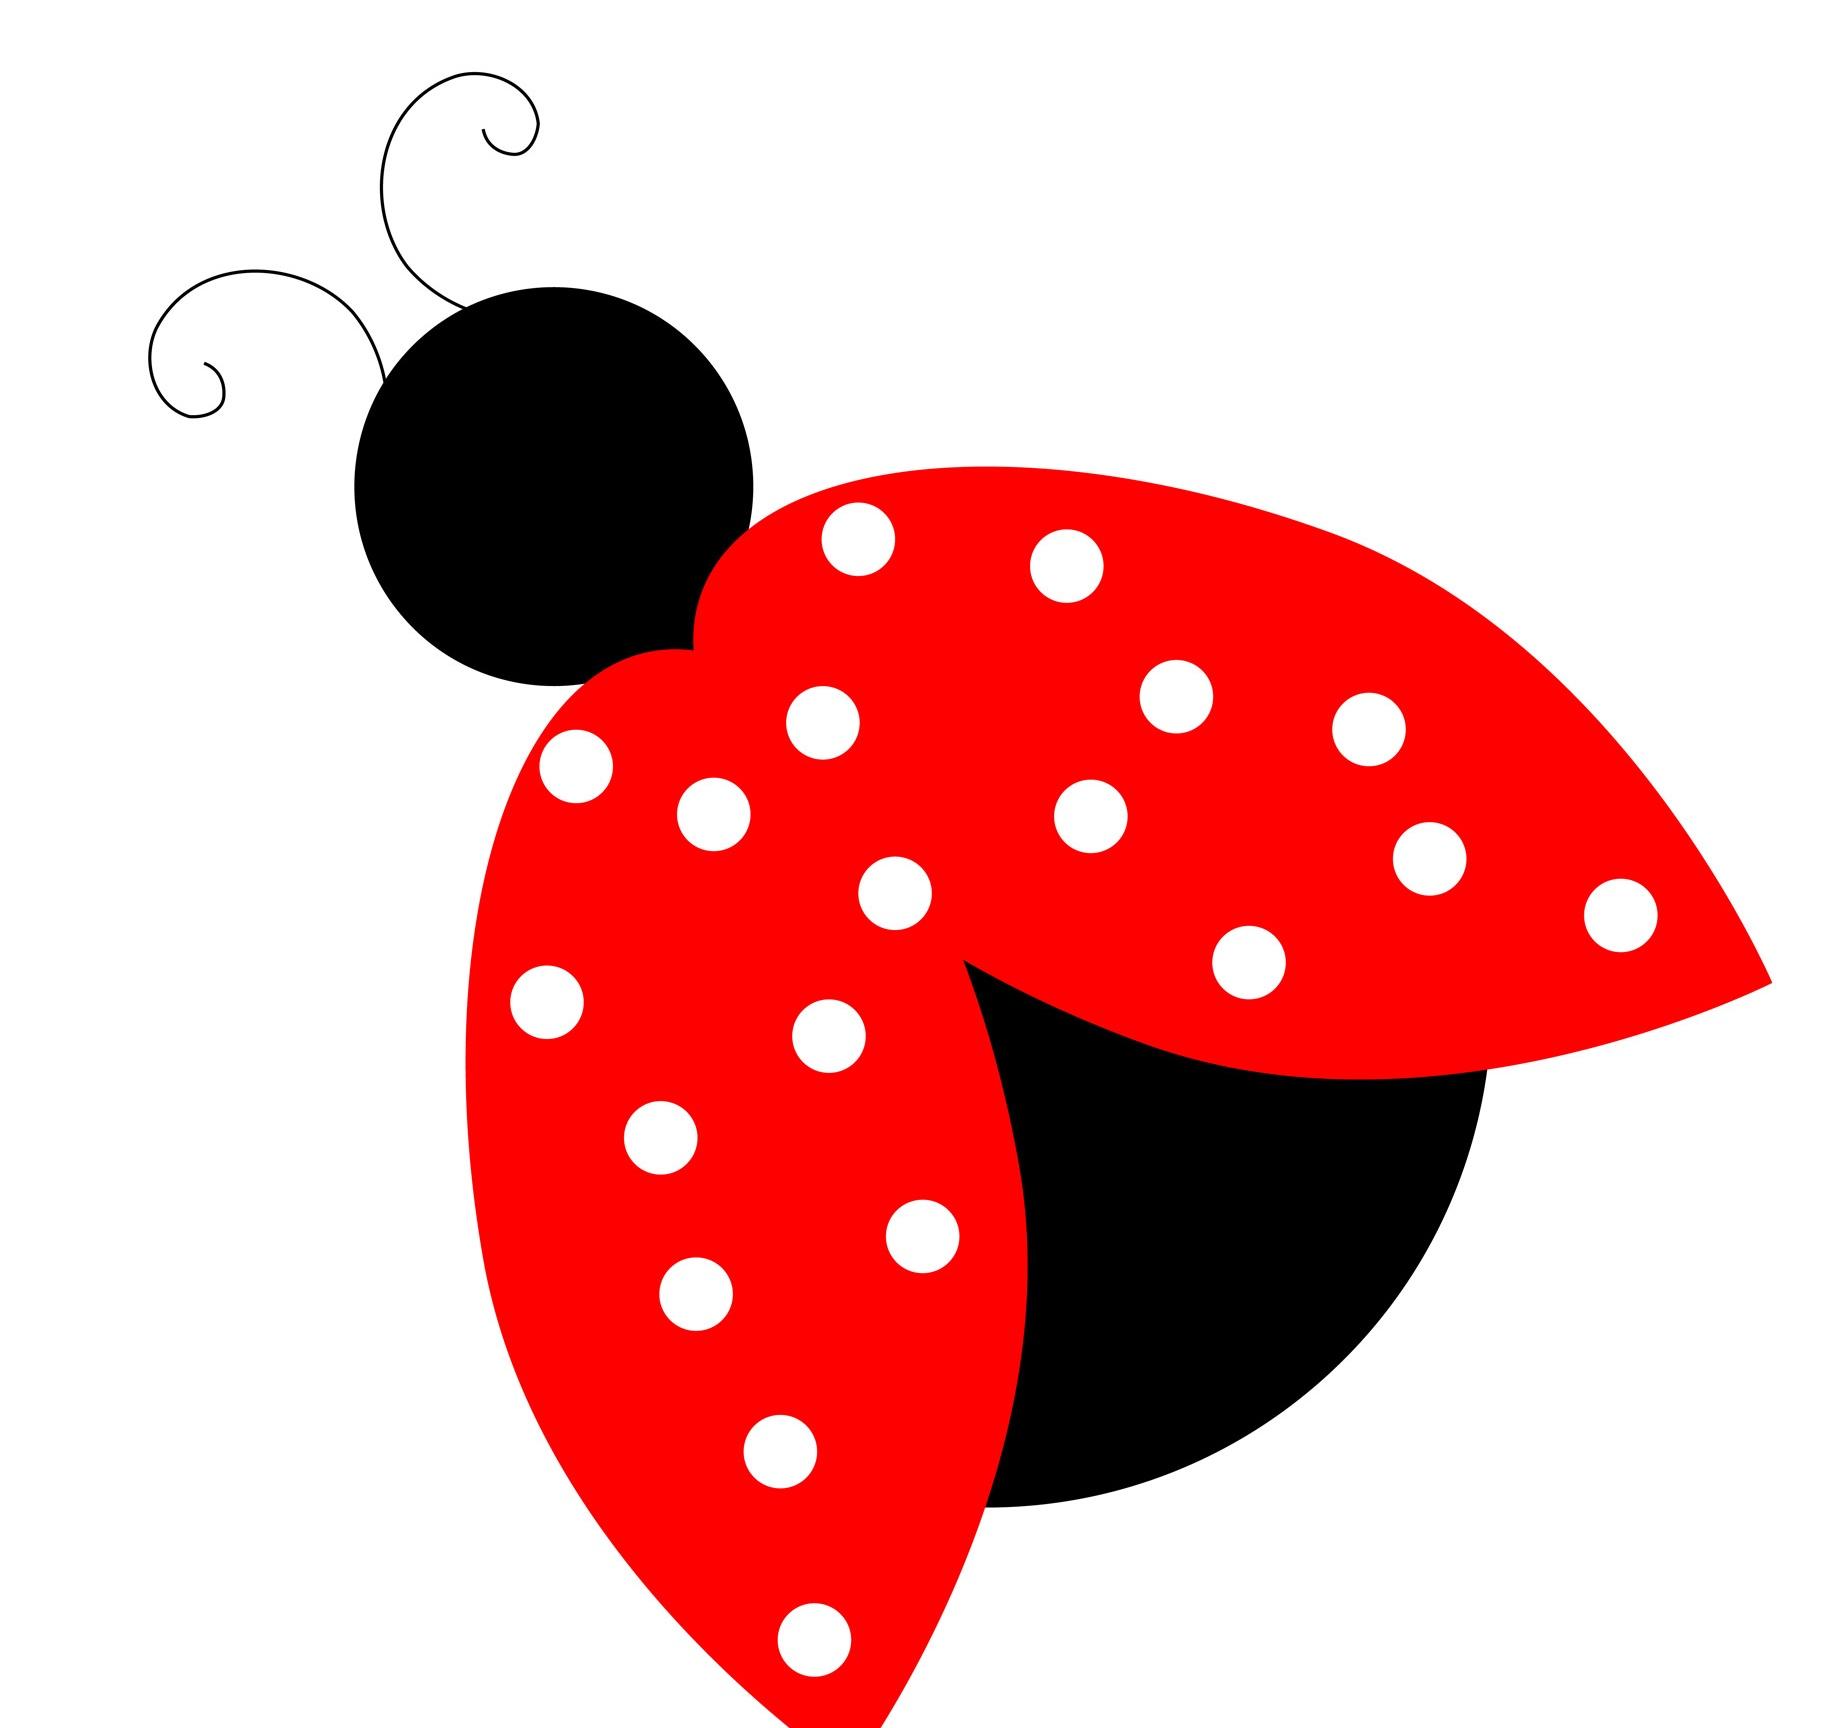 Bugs clipart ladybug Clip lady bug leaf art